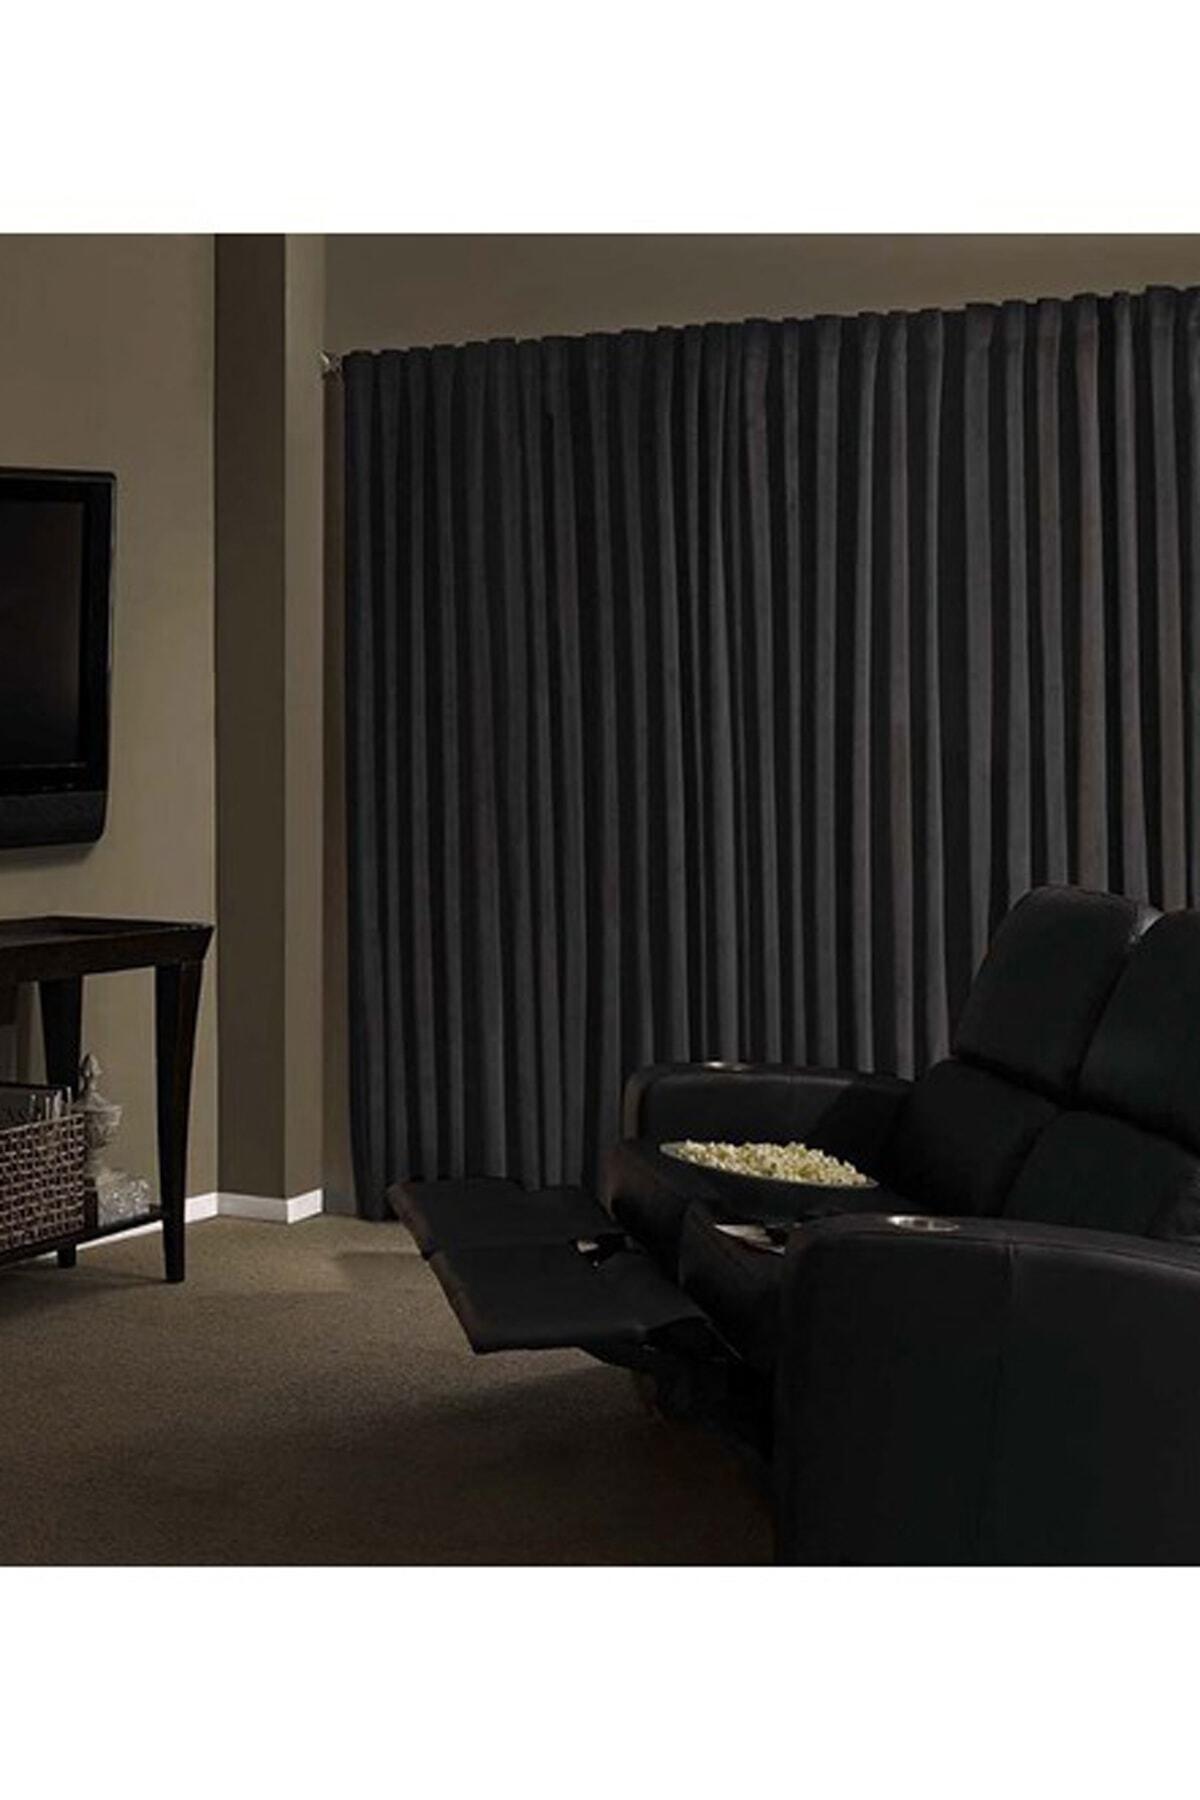 Brillant Blackout Karartma Güneşlik Perde Pilesiz Siyah Lcrblck 100x200 2